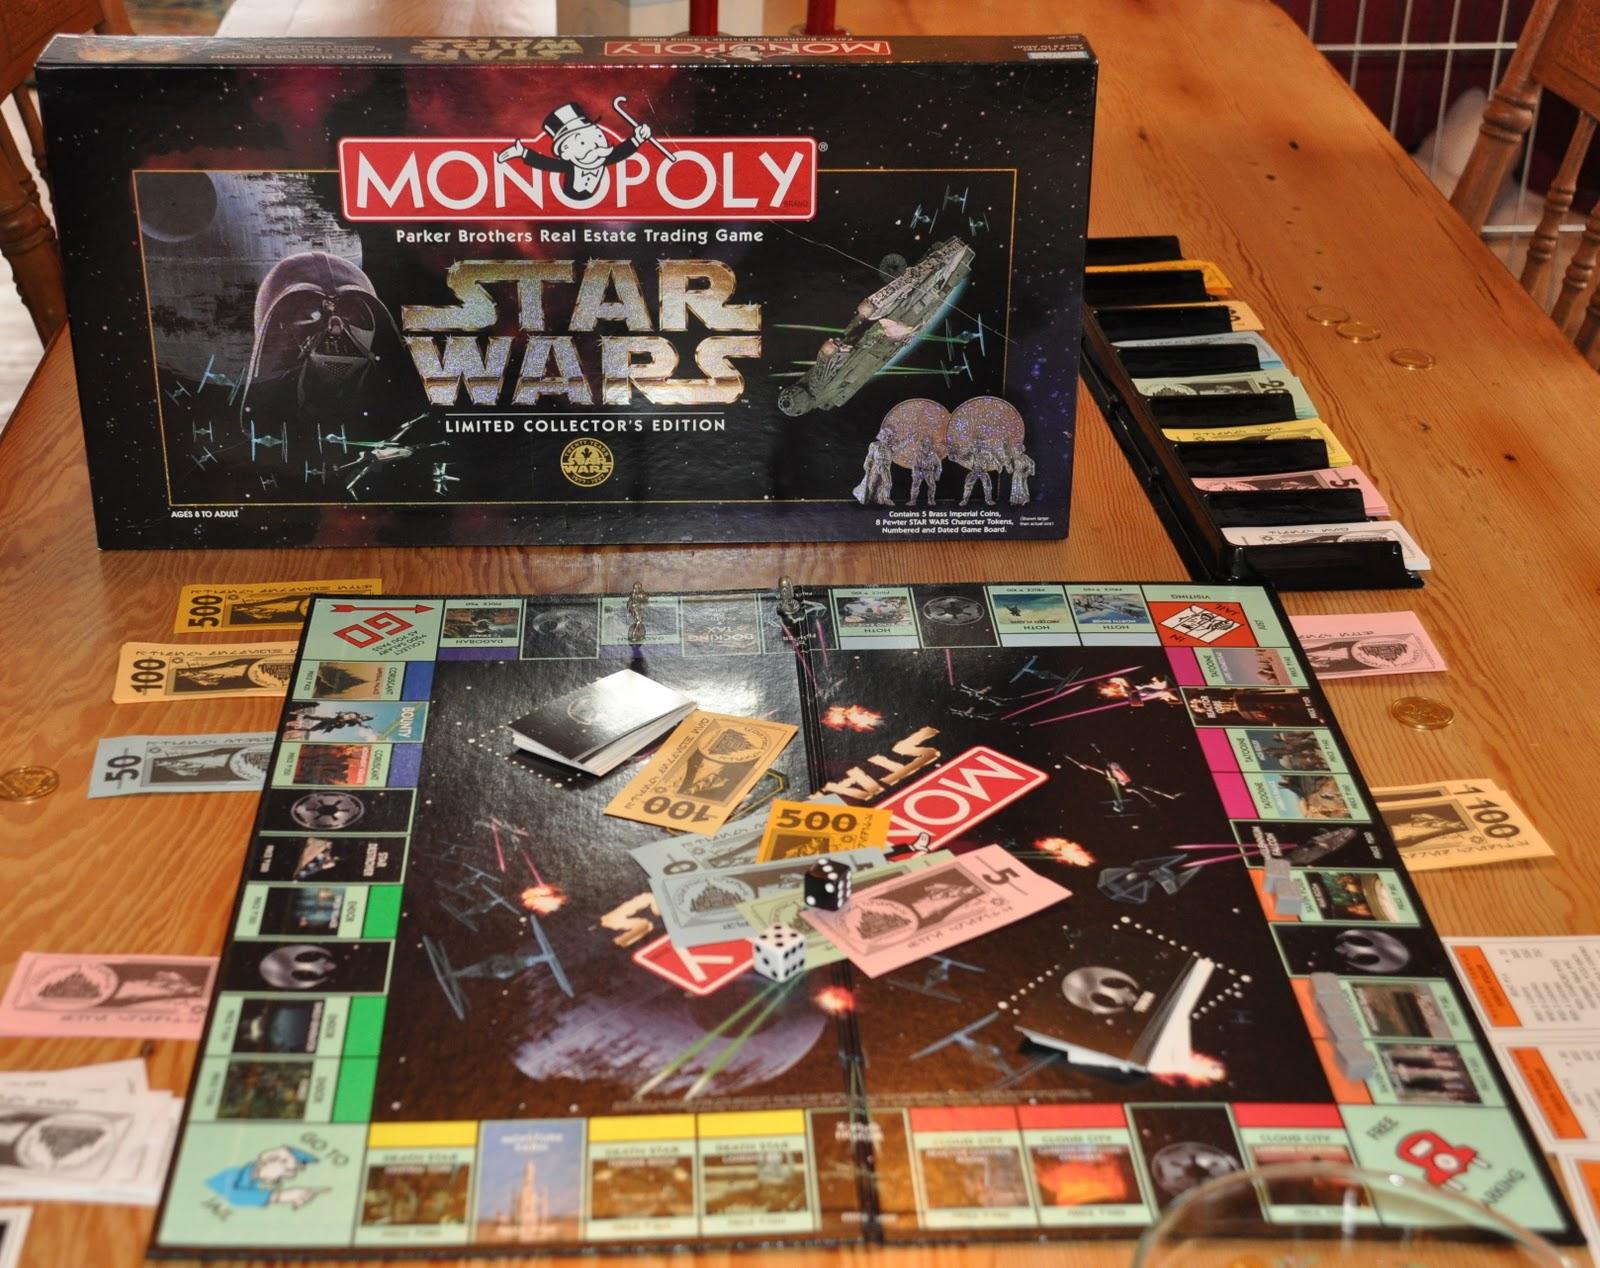 mediarun-com-monopoly-star-wars